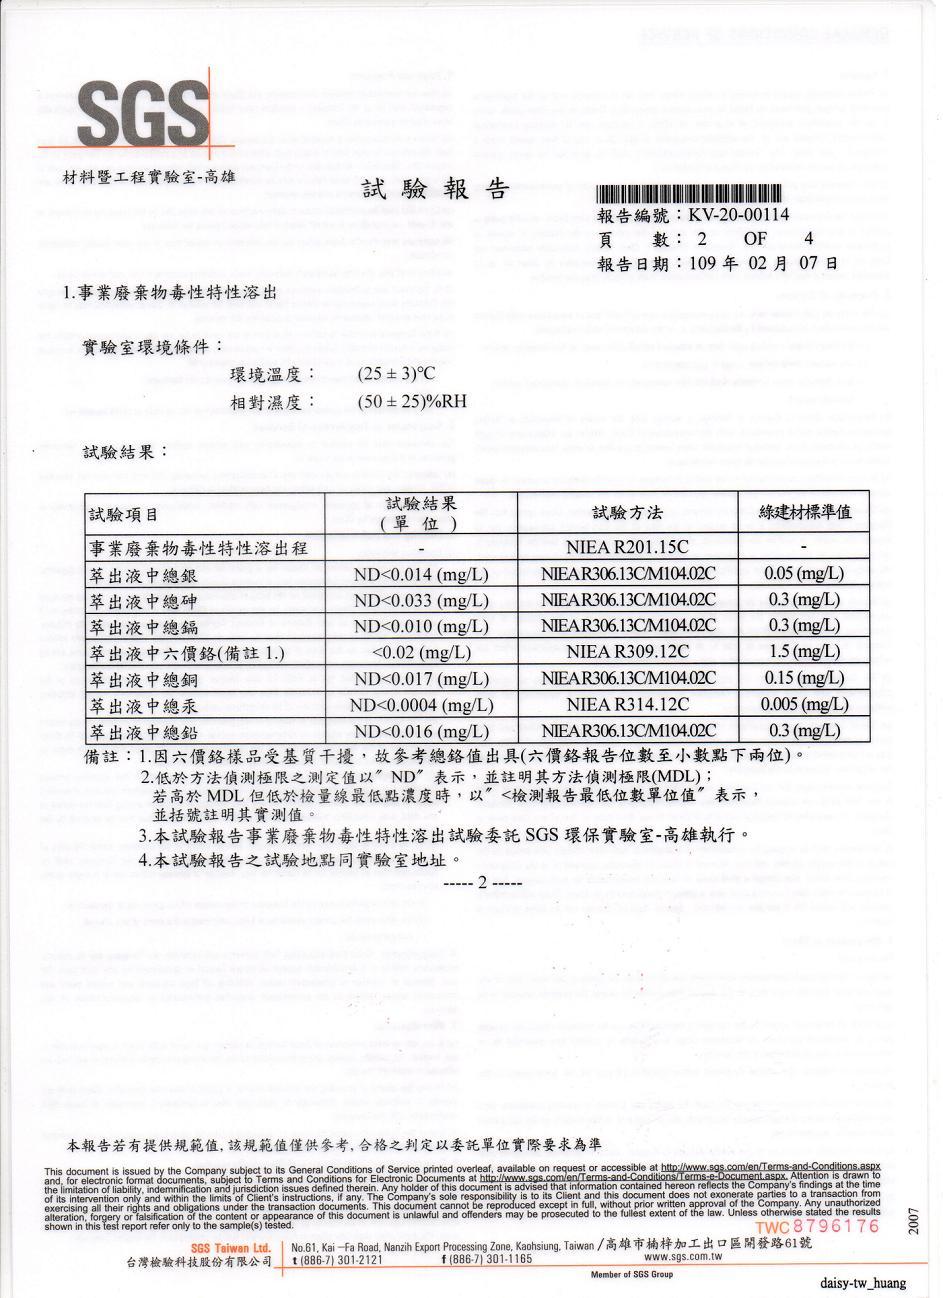 SGS-甲醛、八大重金属检验报告